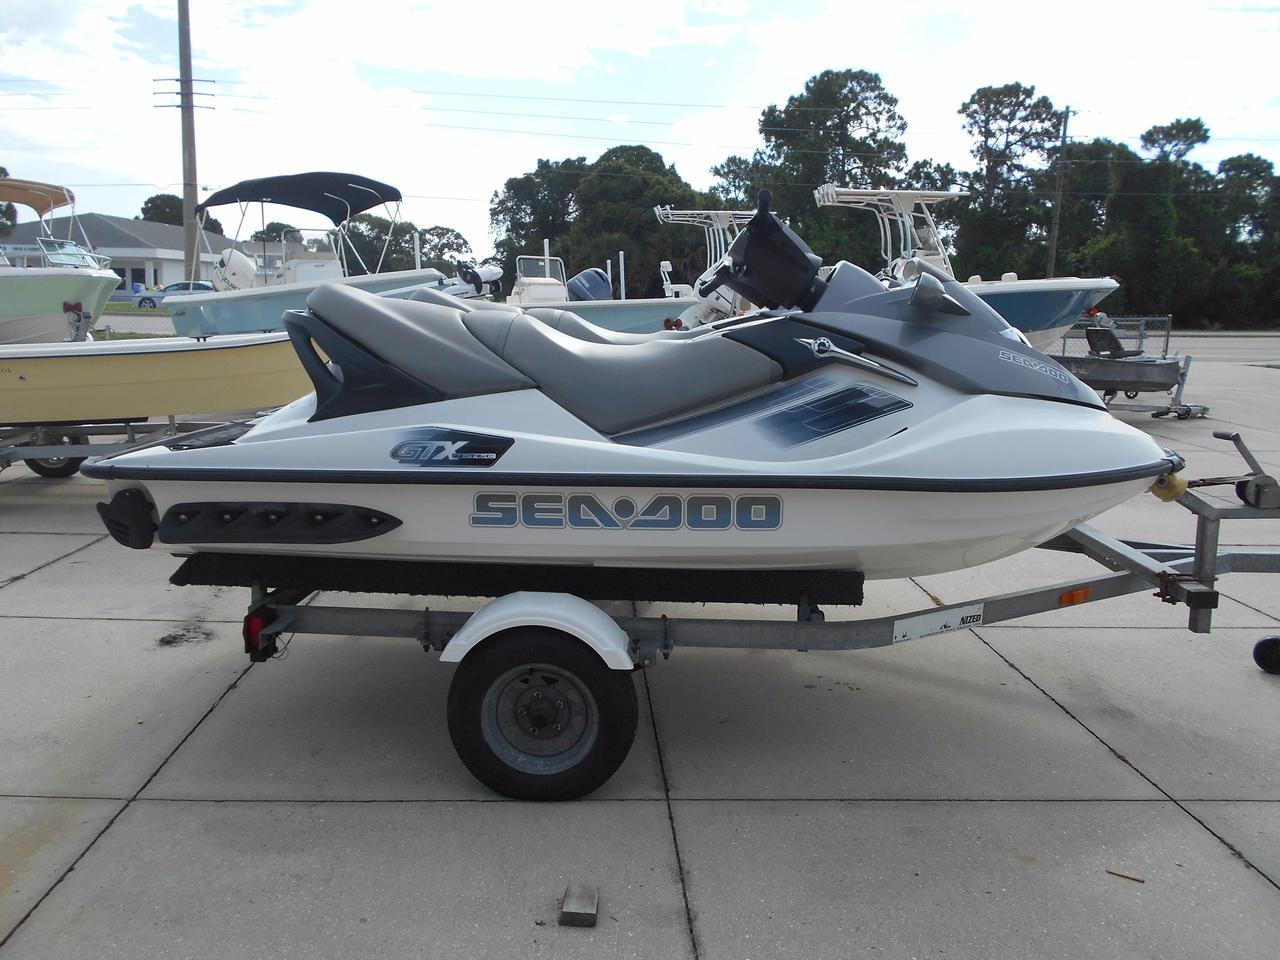 2006 Used Sea-Doo GTX 4-tec High Performance Boat For Sale